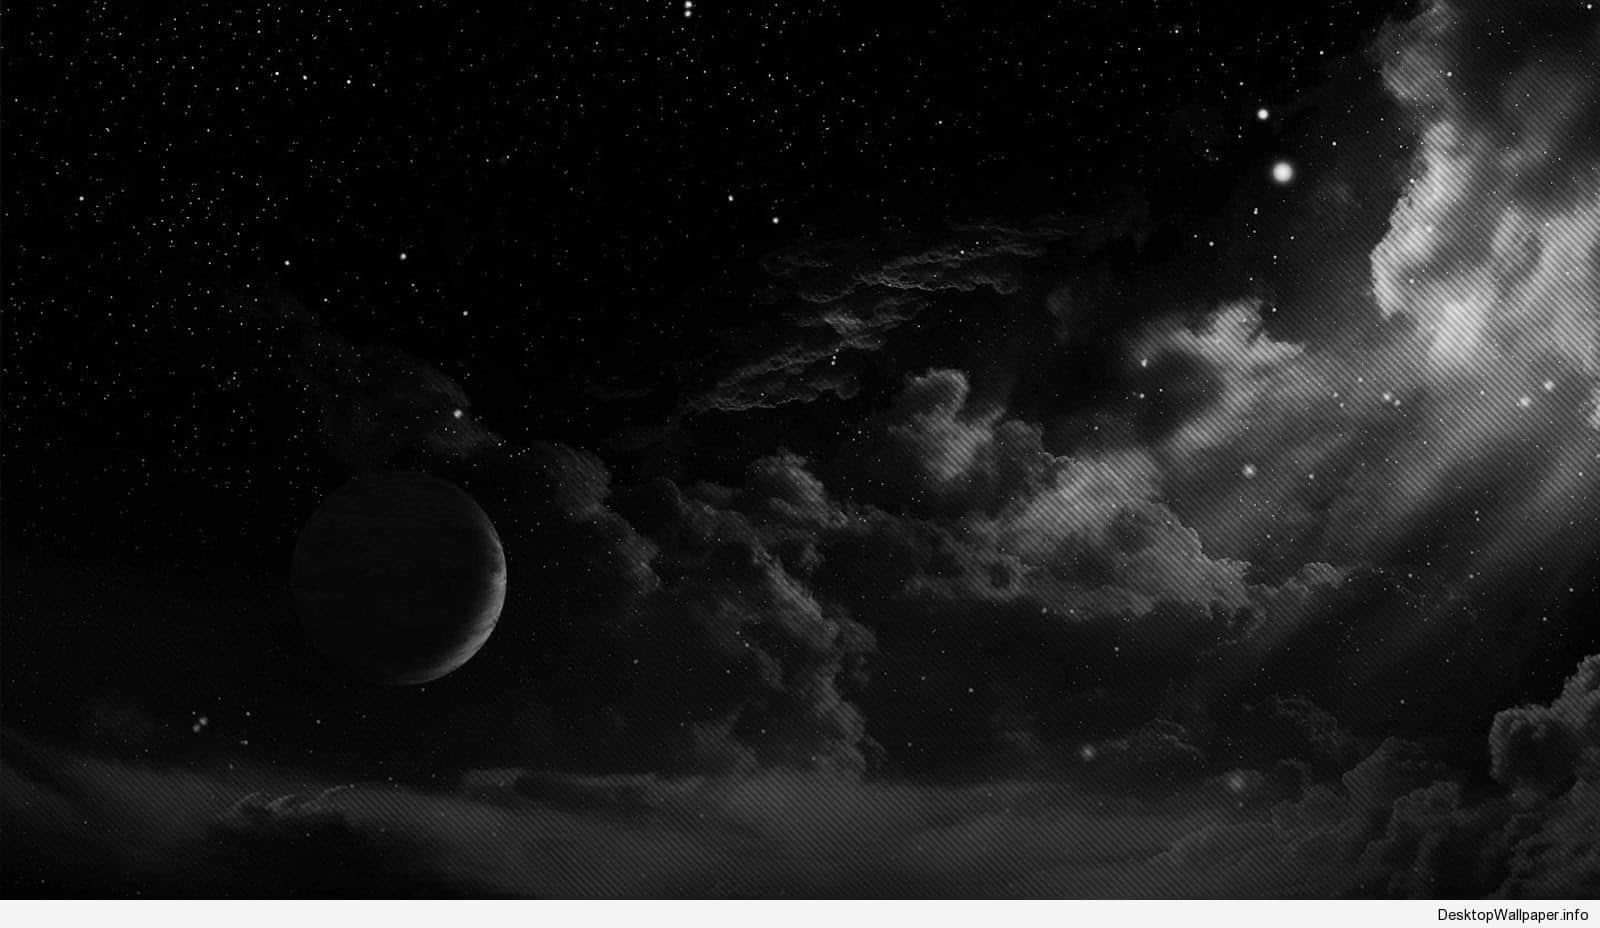 Grunge Black Aesthetic Horizontal Wallpapers - Wallpaper Cave